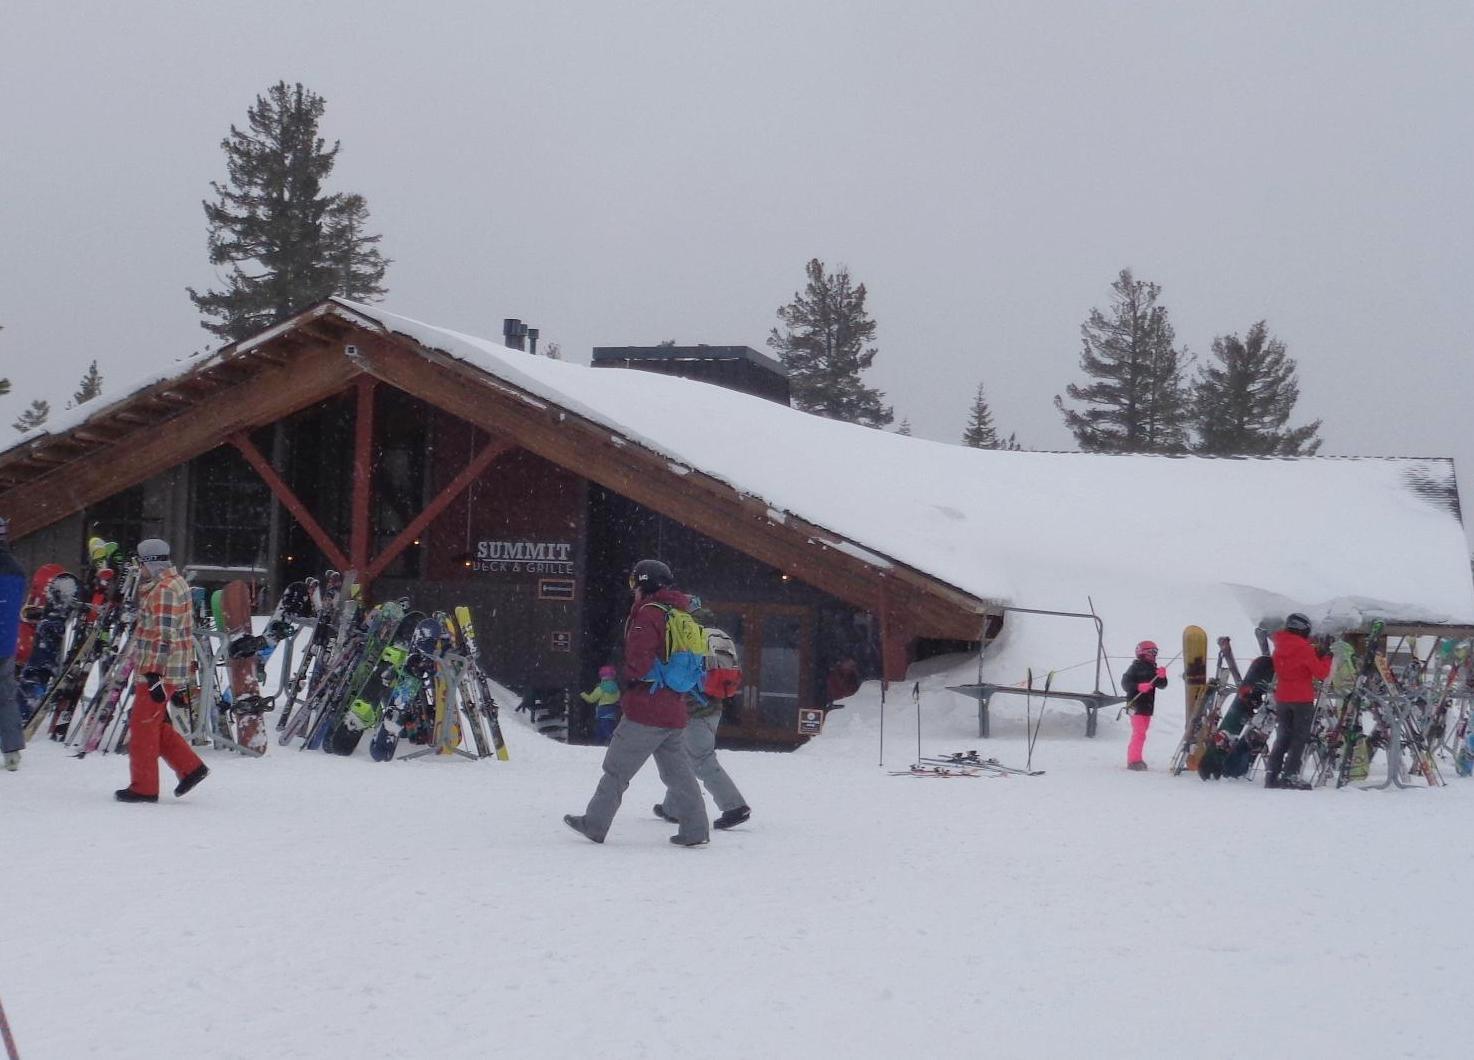 Northstar's Summit Lodge